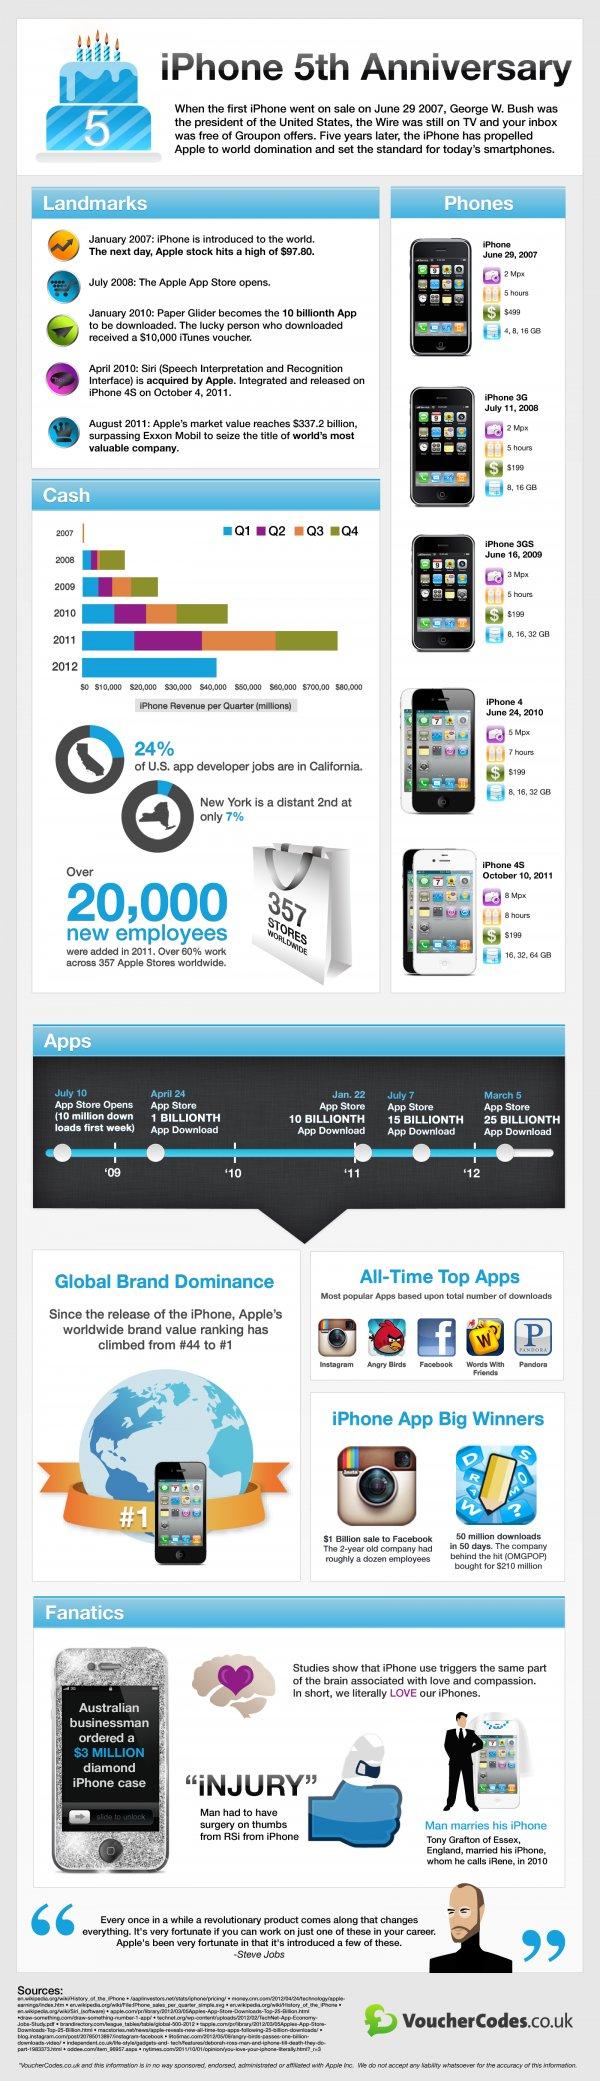 iphone-aniversario-infografia